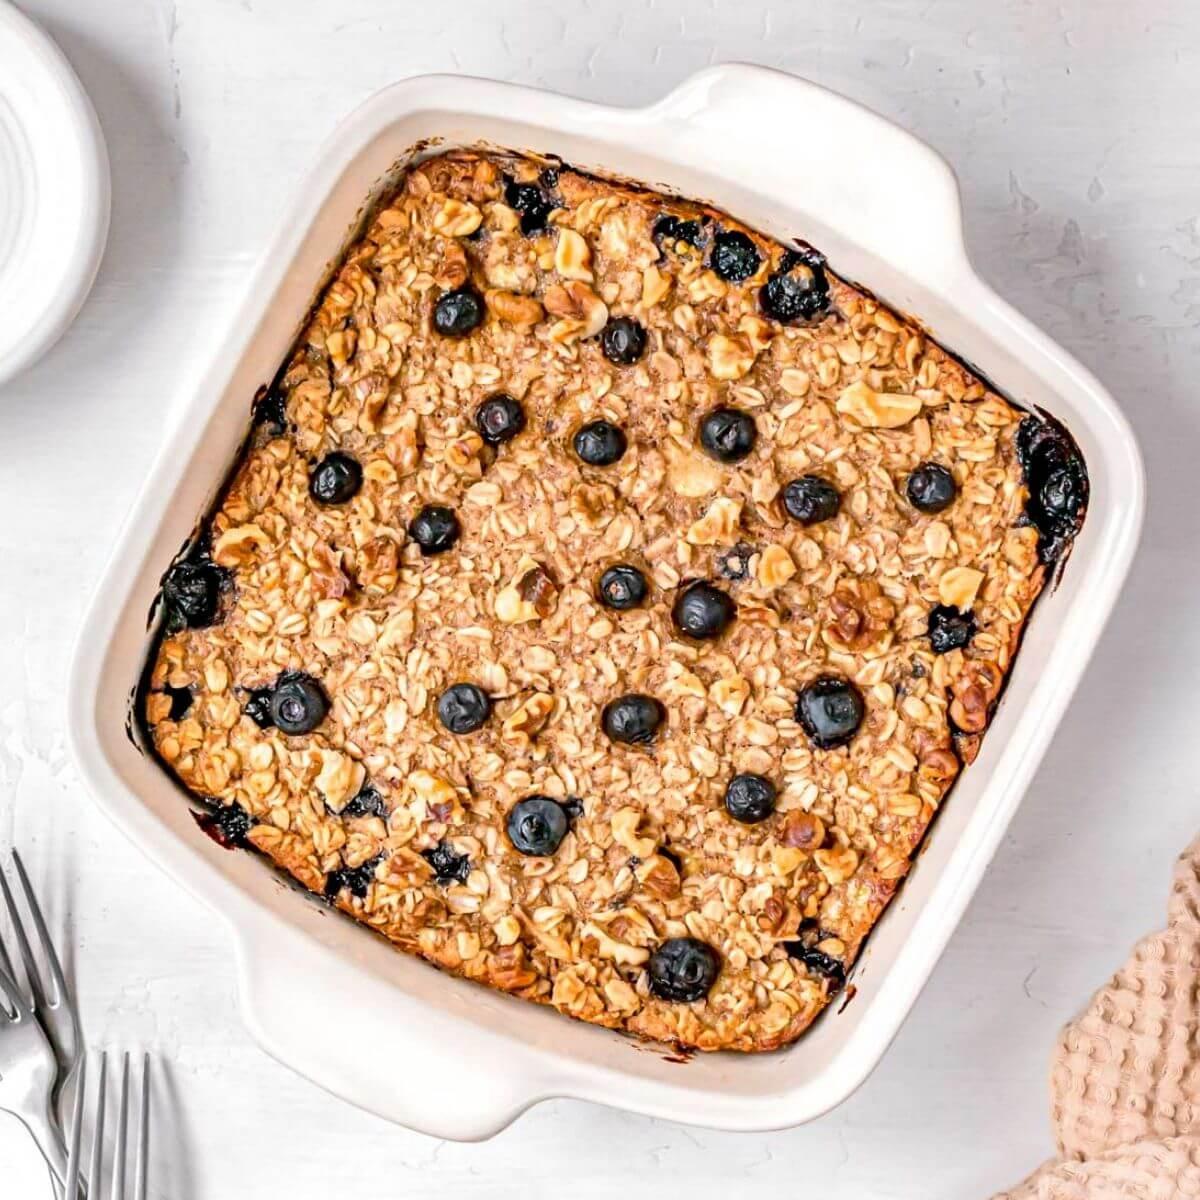 vegan baked oatmeal recipe (egg free)